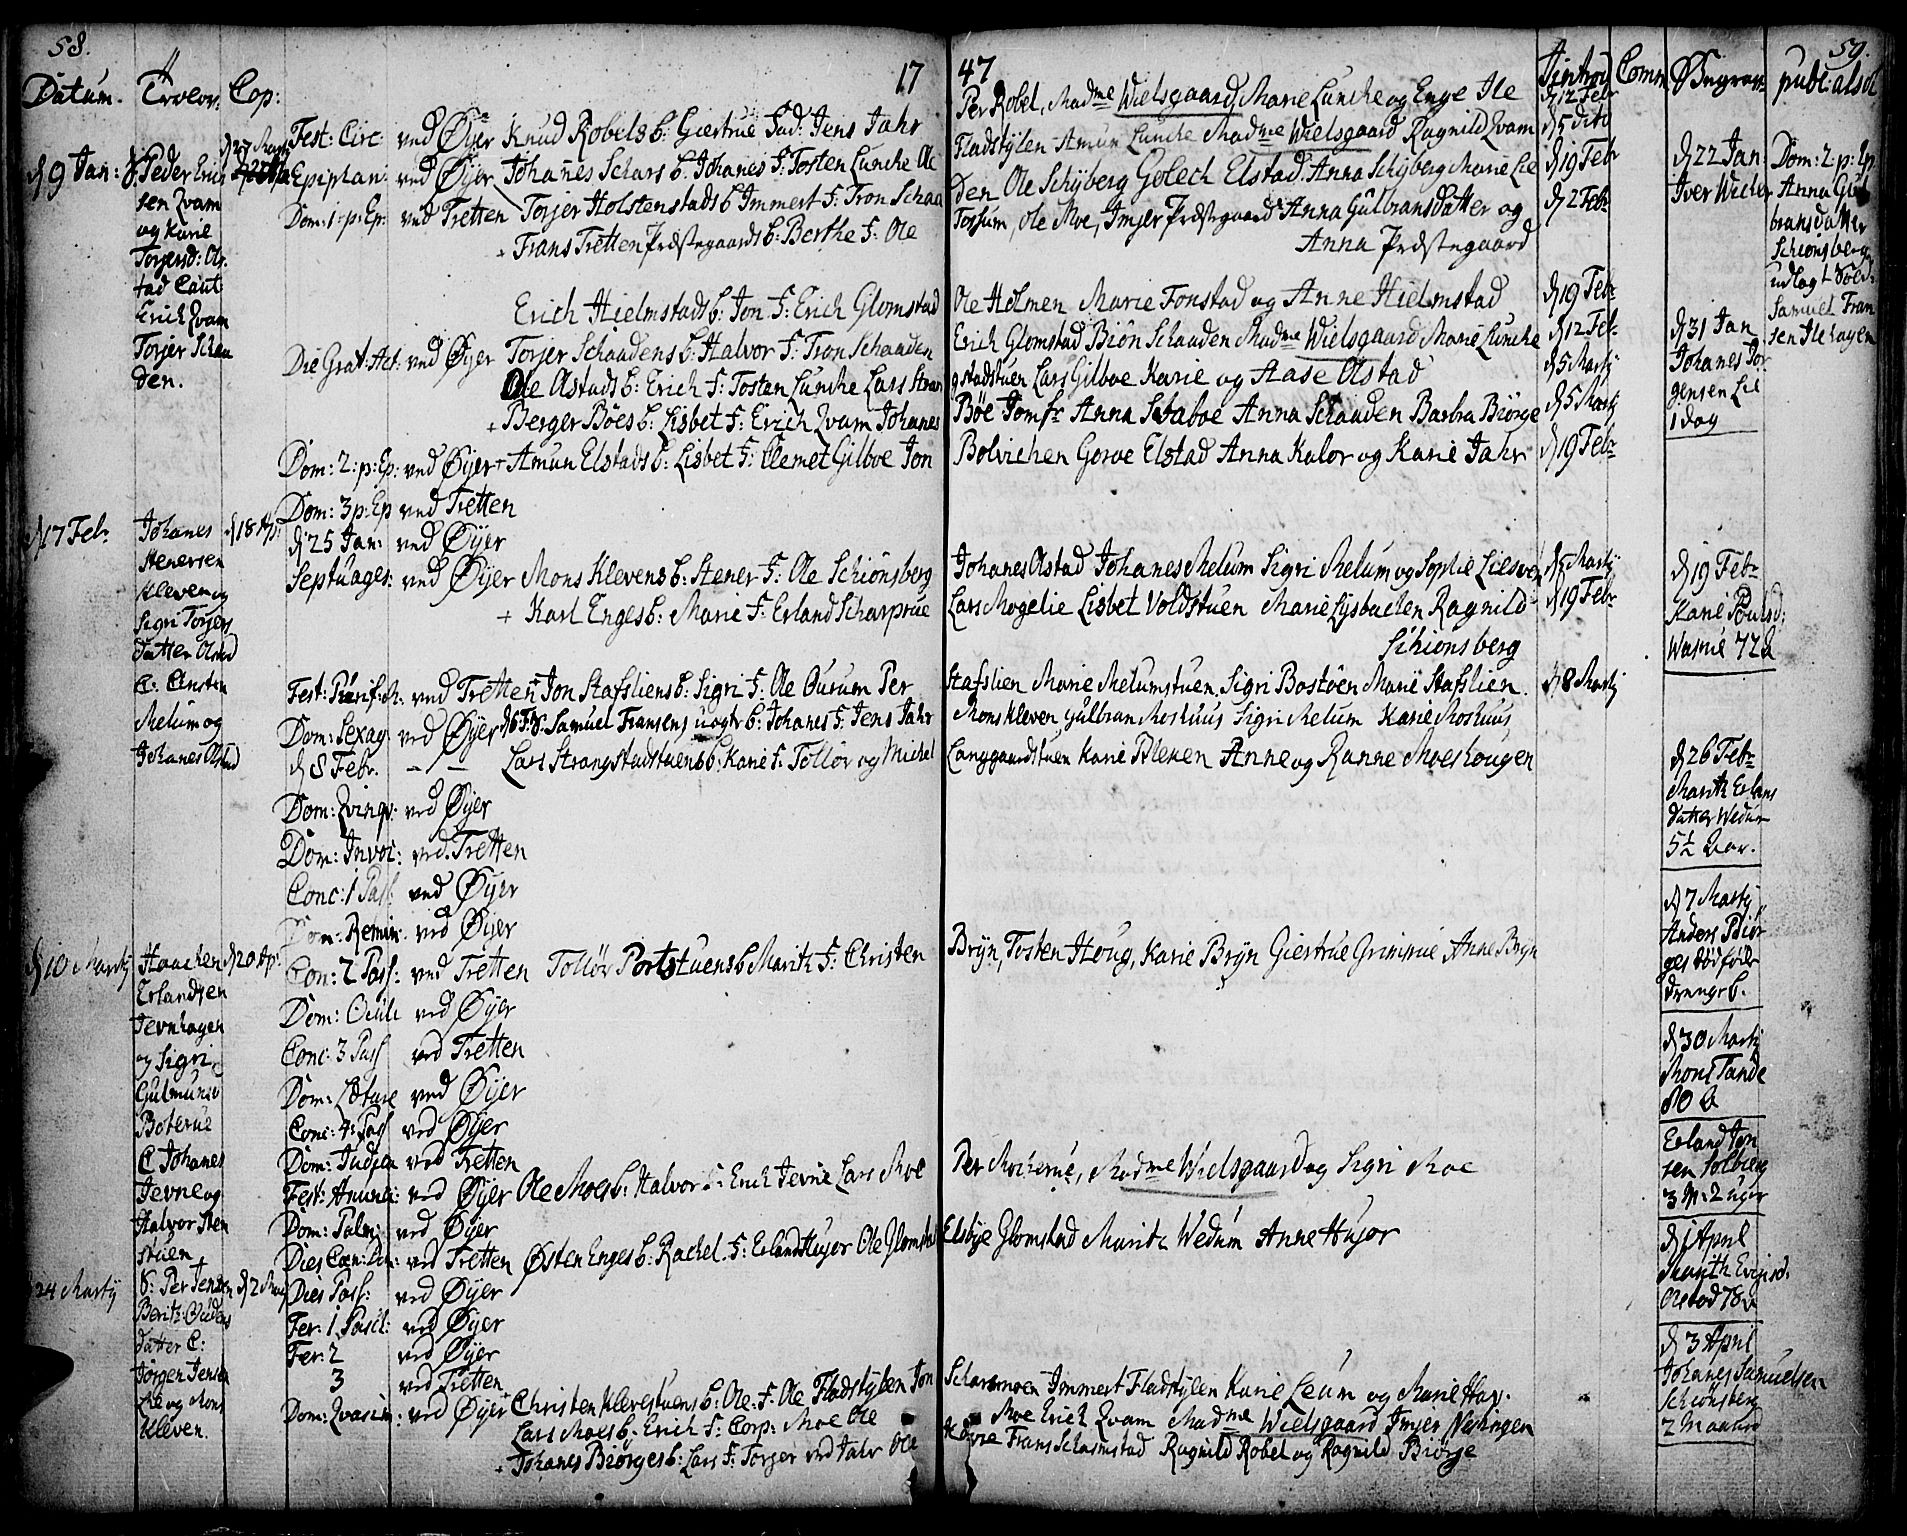 SAH, Øyer prestekontor, Ministerialbok nr. 2, 1733-1784, s. 58-59